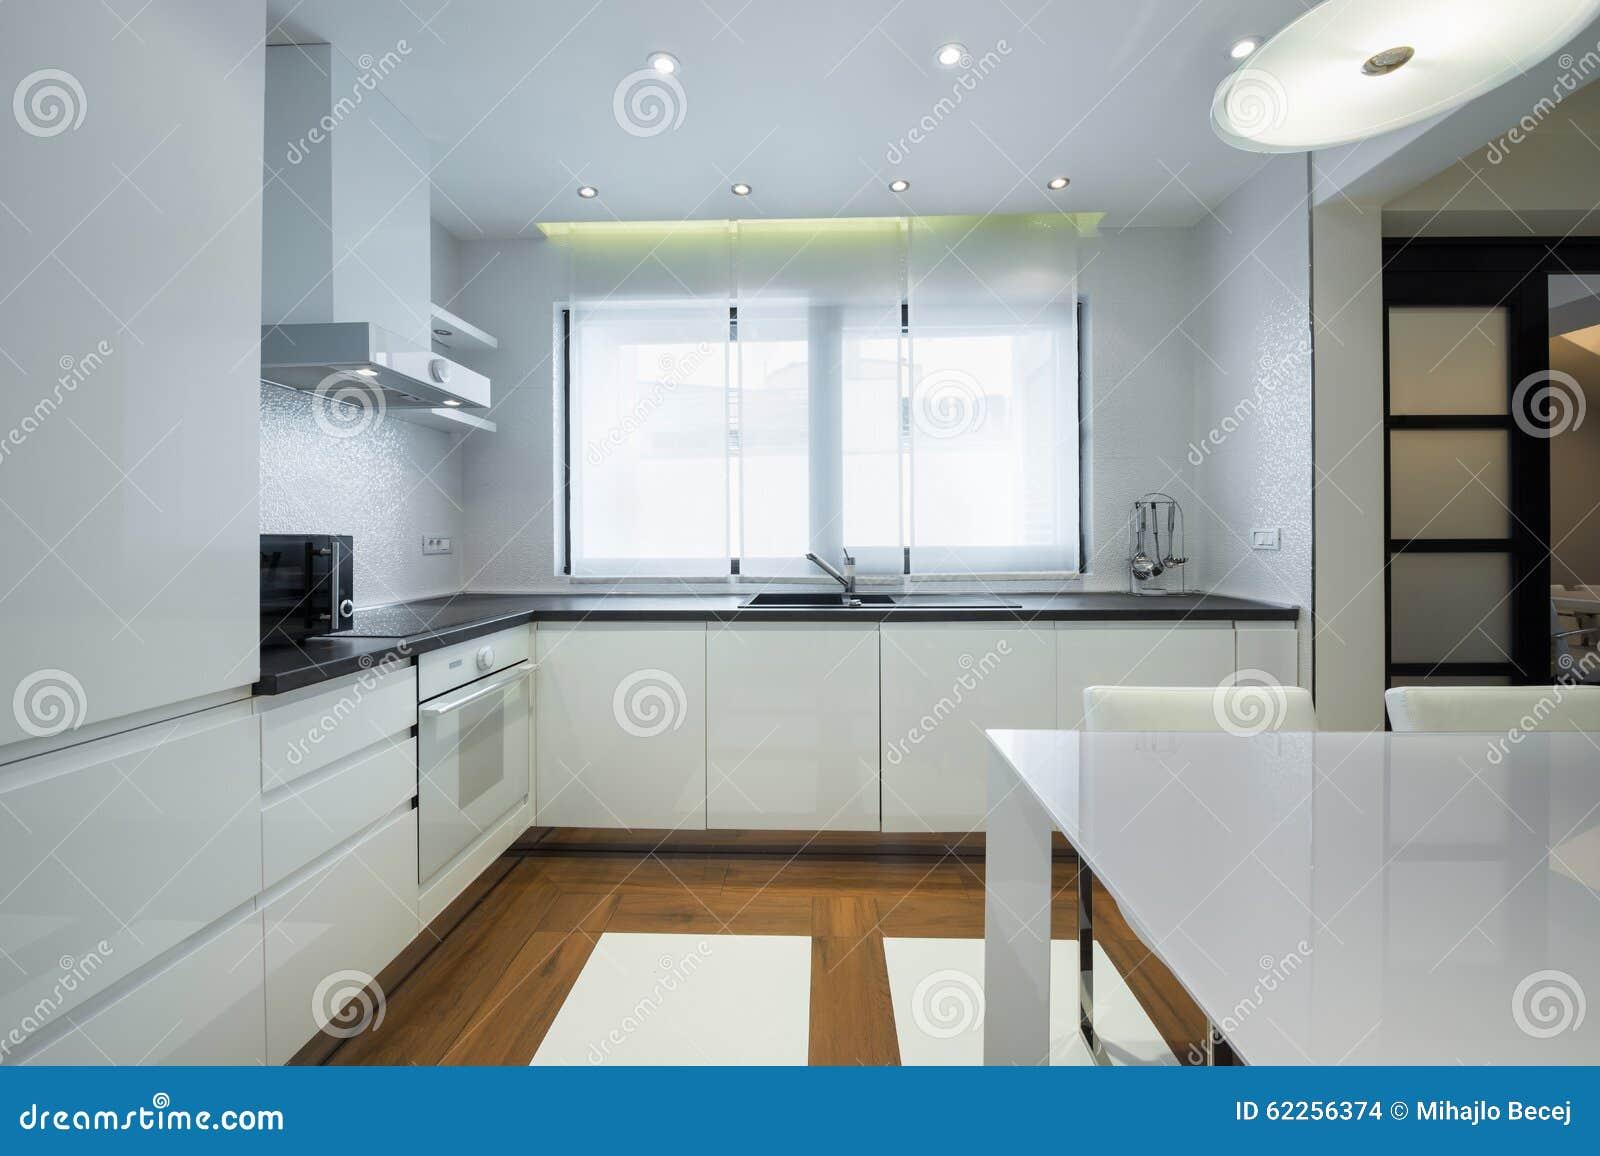 Interior Of A Modern Luxury Bright White Kitchen Stock Photo - Image ...